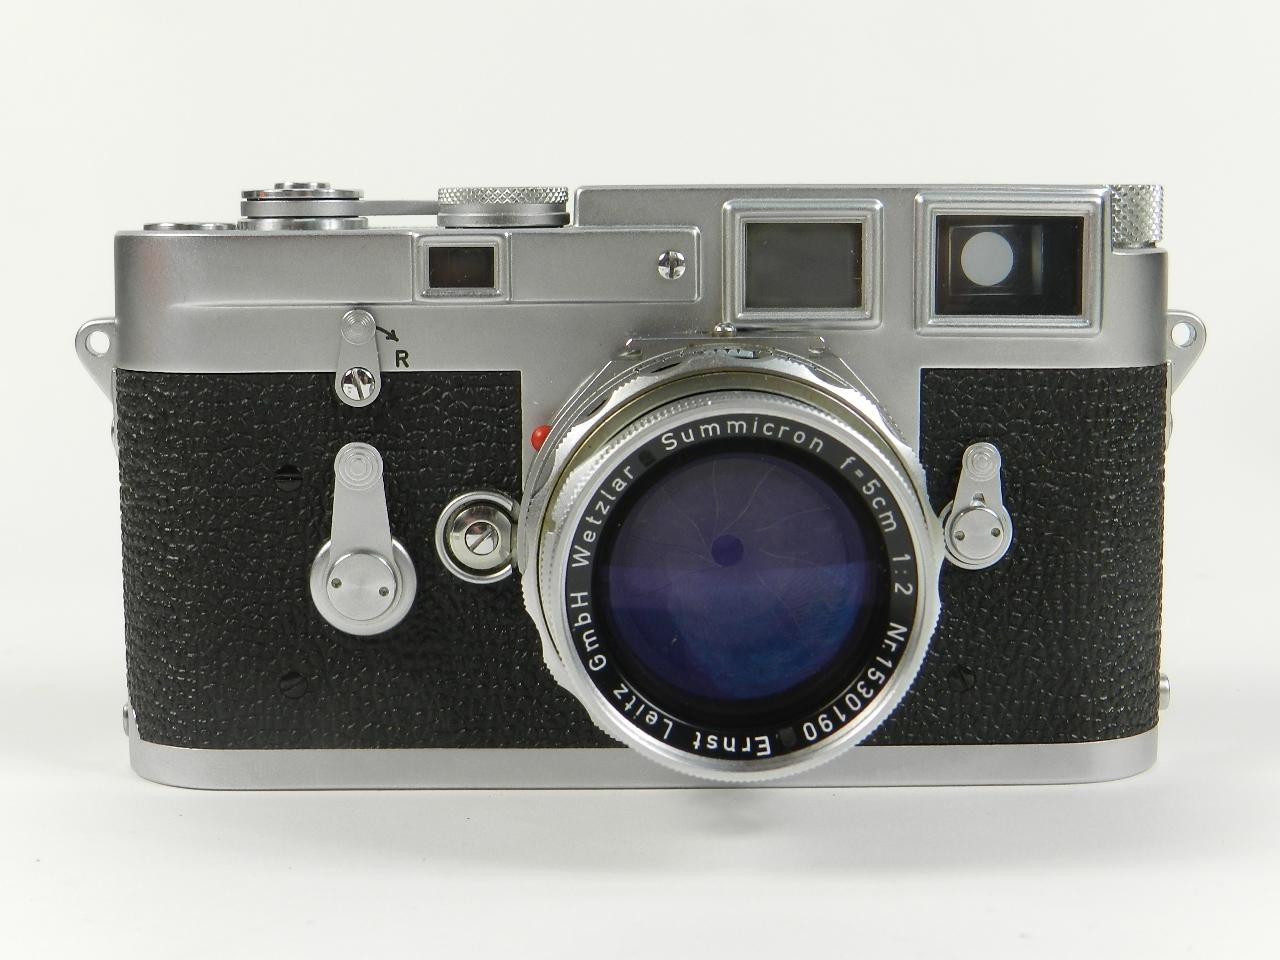 Imagen LEICA M3 AÑO 1957 + 4 OBJETIVOS + EXTRAS 28532